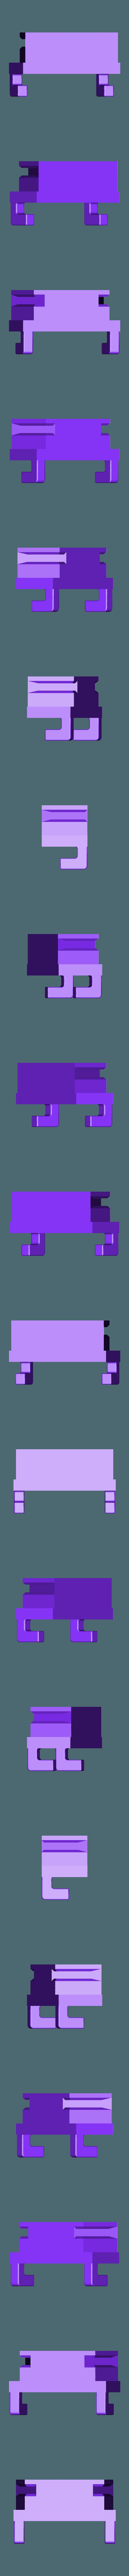 Wirestripper_holder_skadis.stl Download free STL file Stanley Wirestripper holder for Skadis • 3D printing template, B2TM